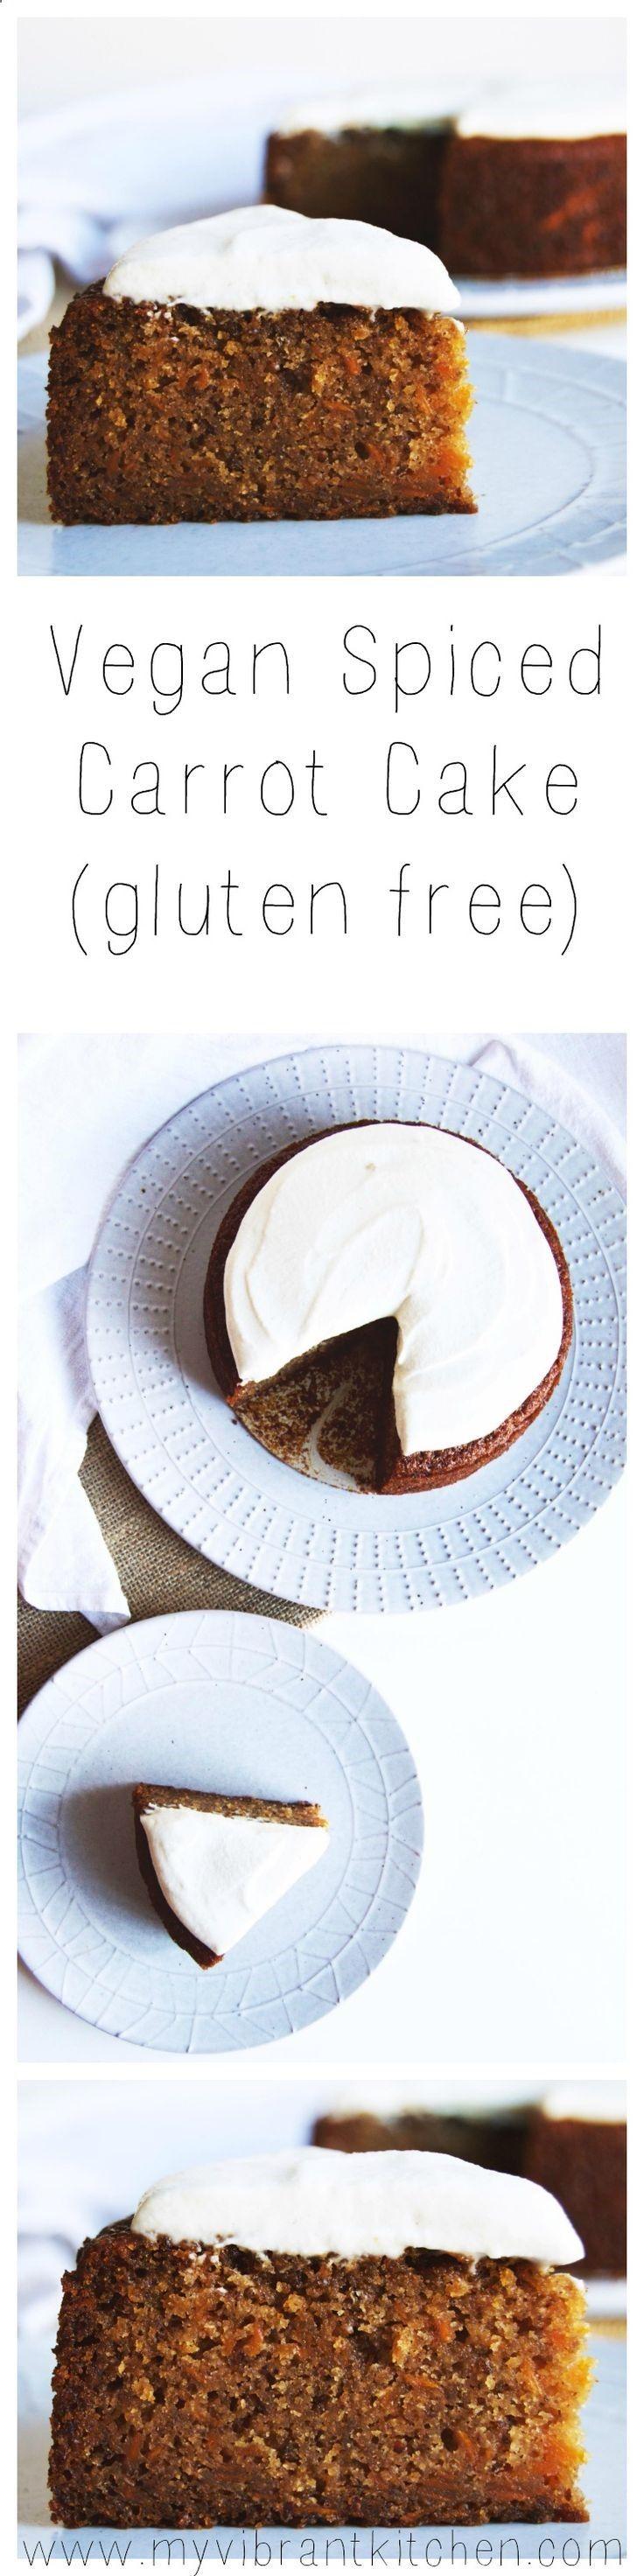 My Vibrant Kitchen | Vegan Spiced Carrot Cake (gluten free) | myvibrantkitchen.com